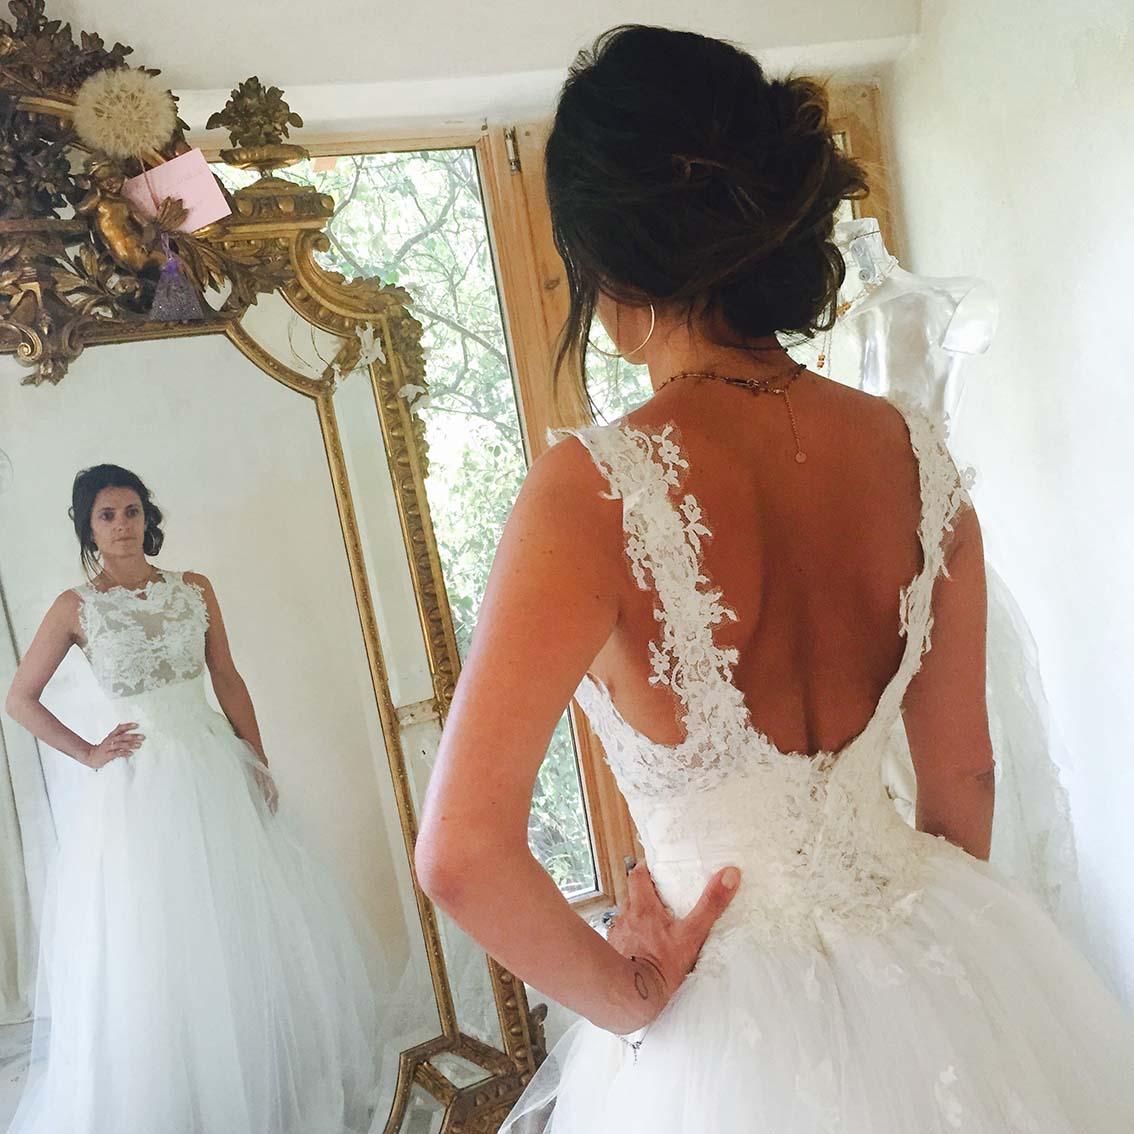 robe-mariee-romantique-tulle-dentelle-quiqui-lamothe